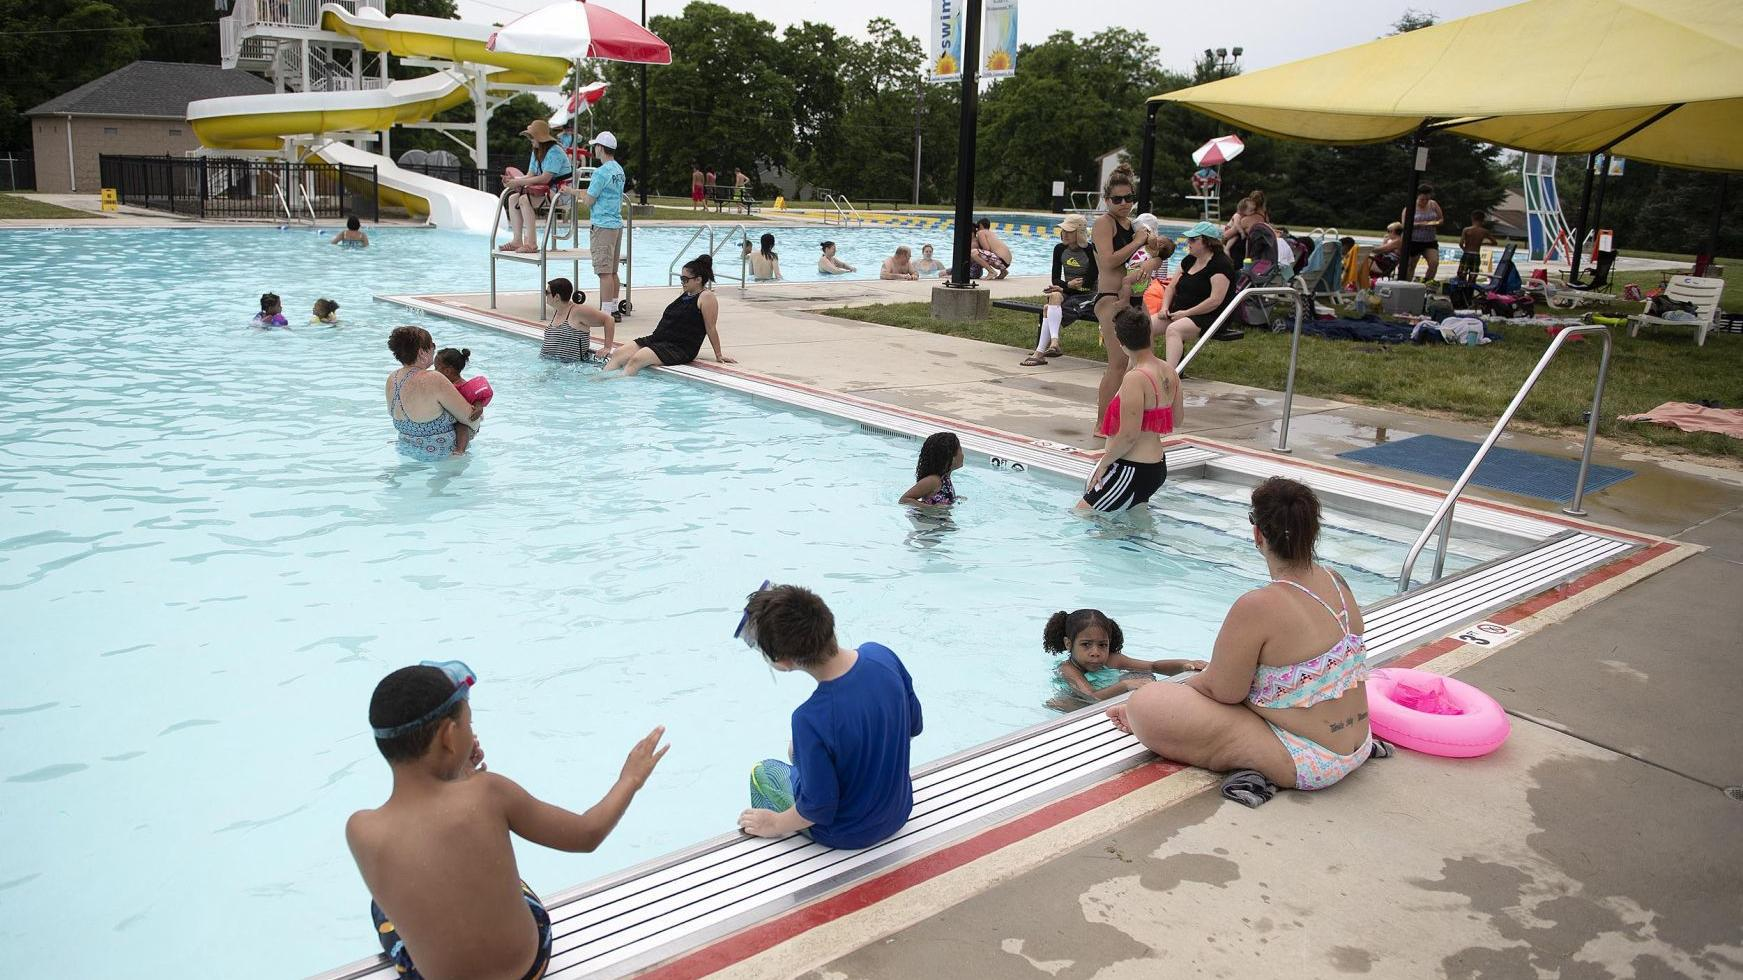 Making a Splash: Midstate pools open Memorial Day weekend